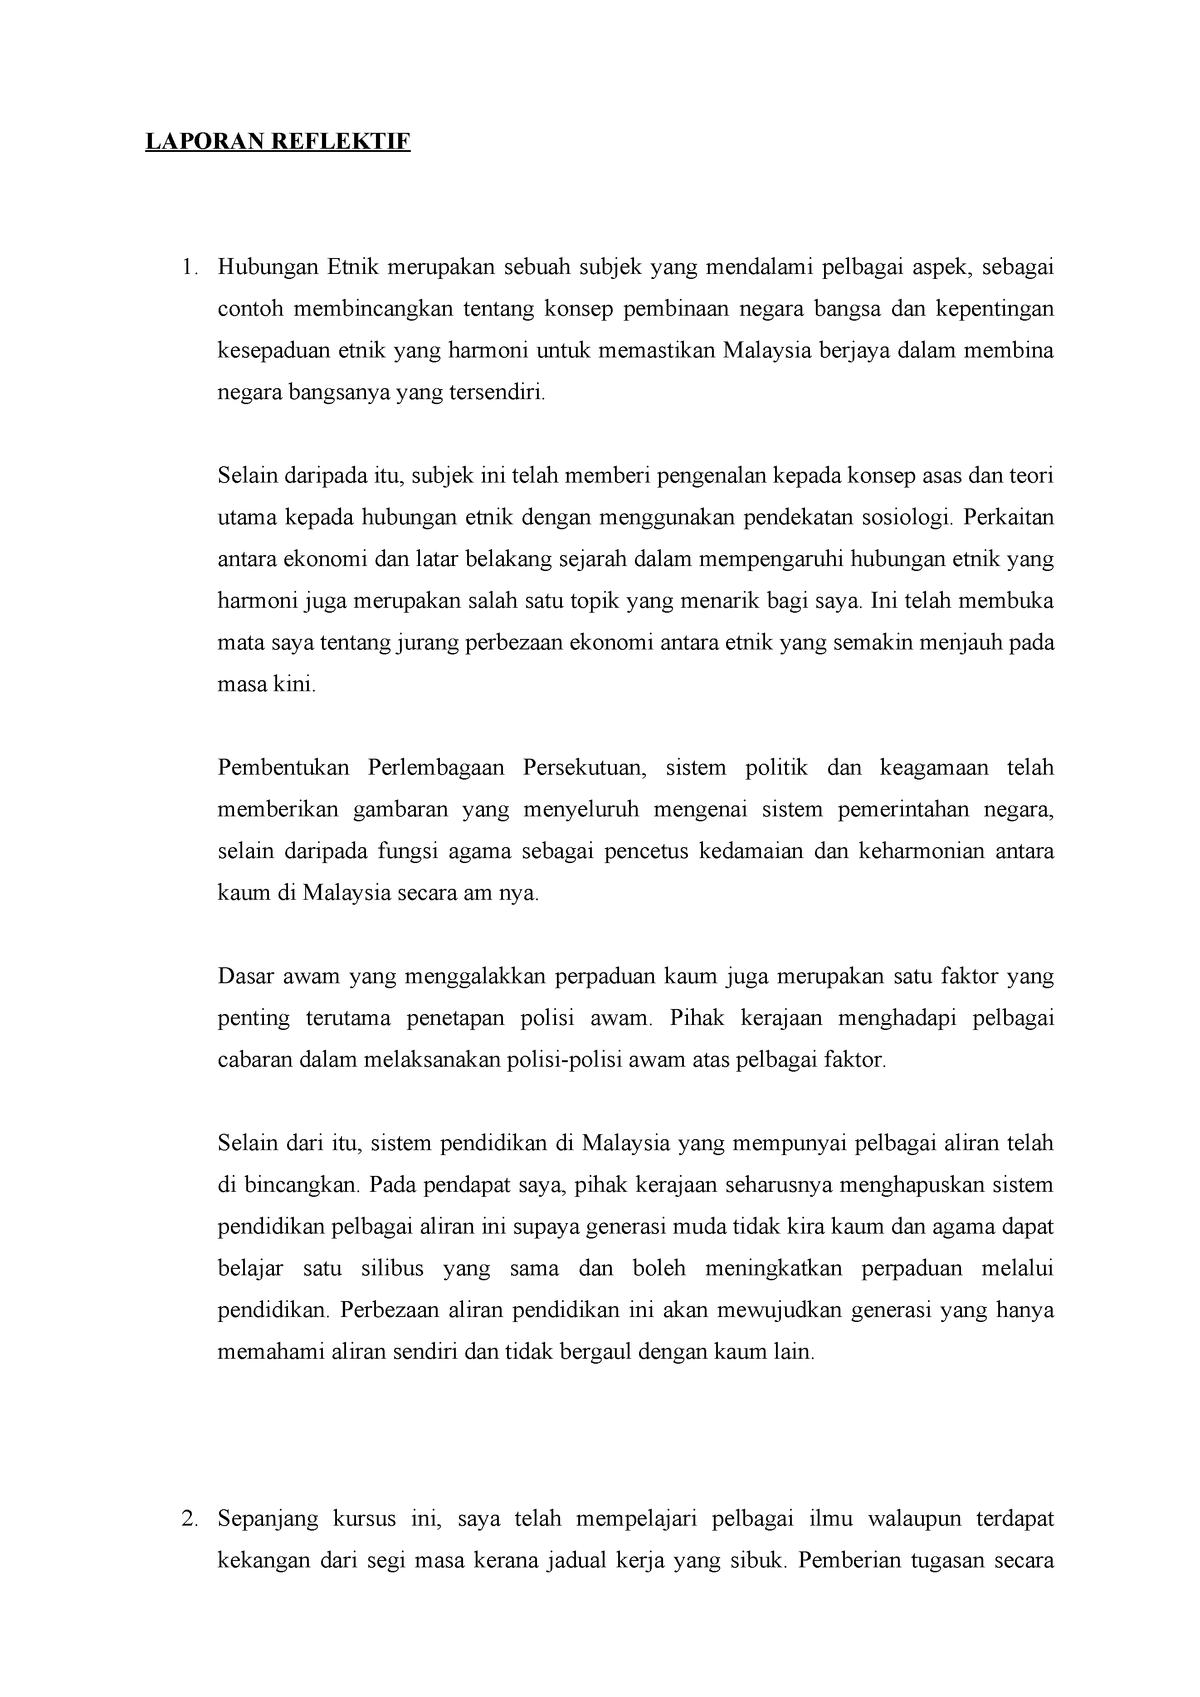 Laporan Reflektif Hubungan Etnik Mpu3112 Studocu